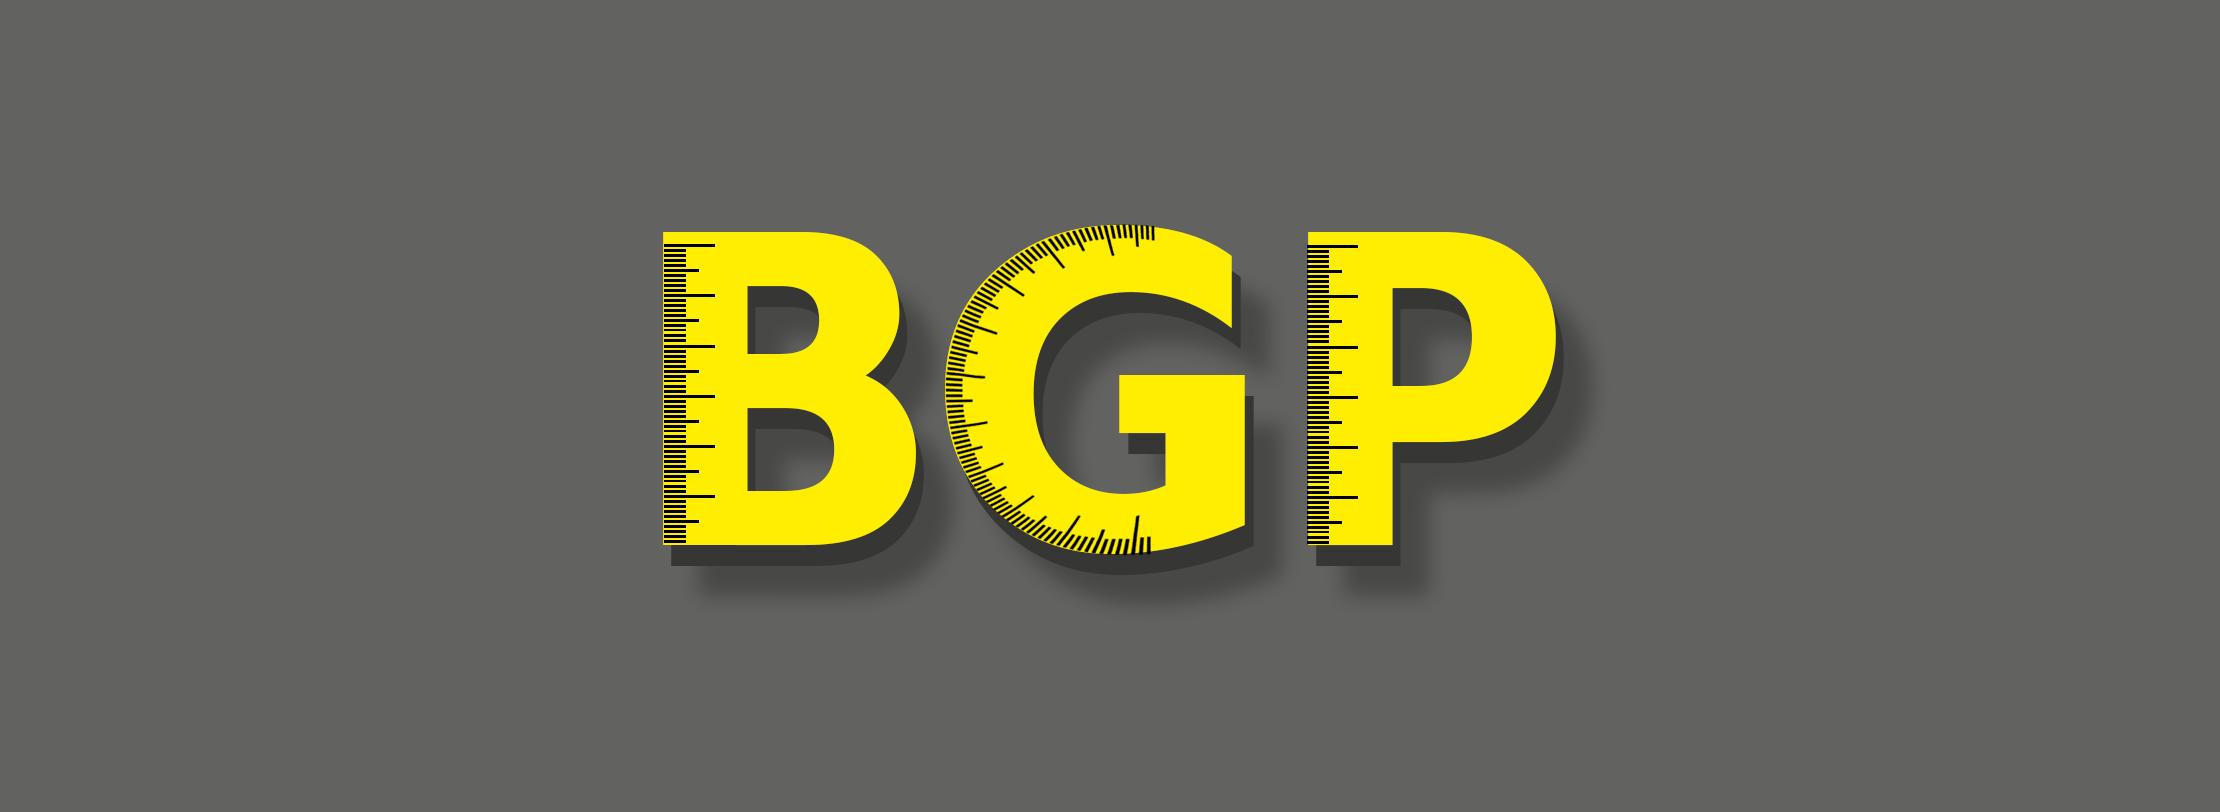 BGP in 2019 - BGP Churn